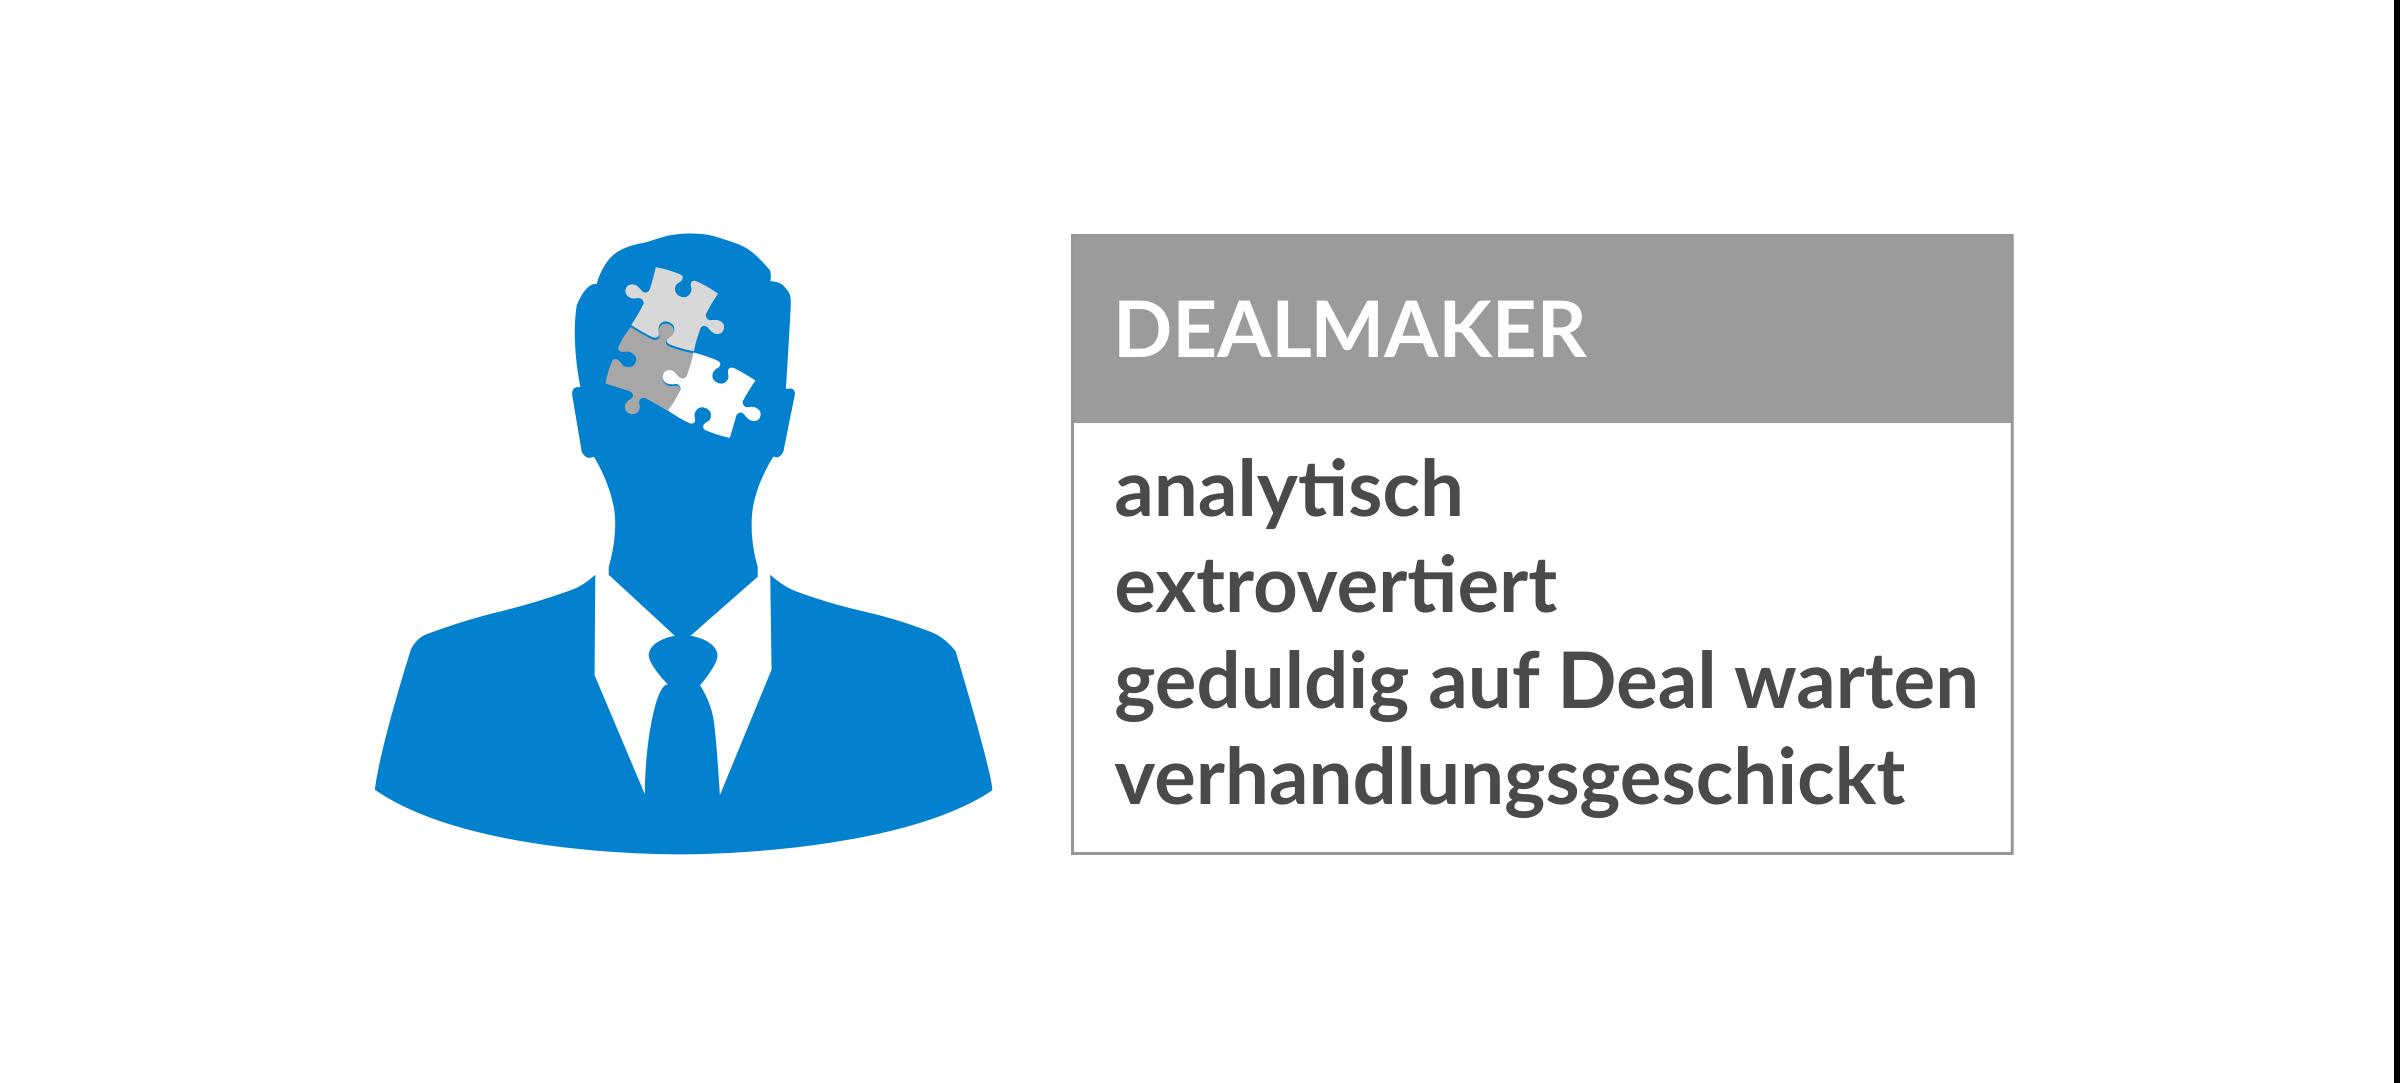 Persönlichkeitstypen Dealmaker